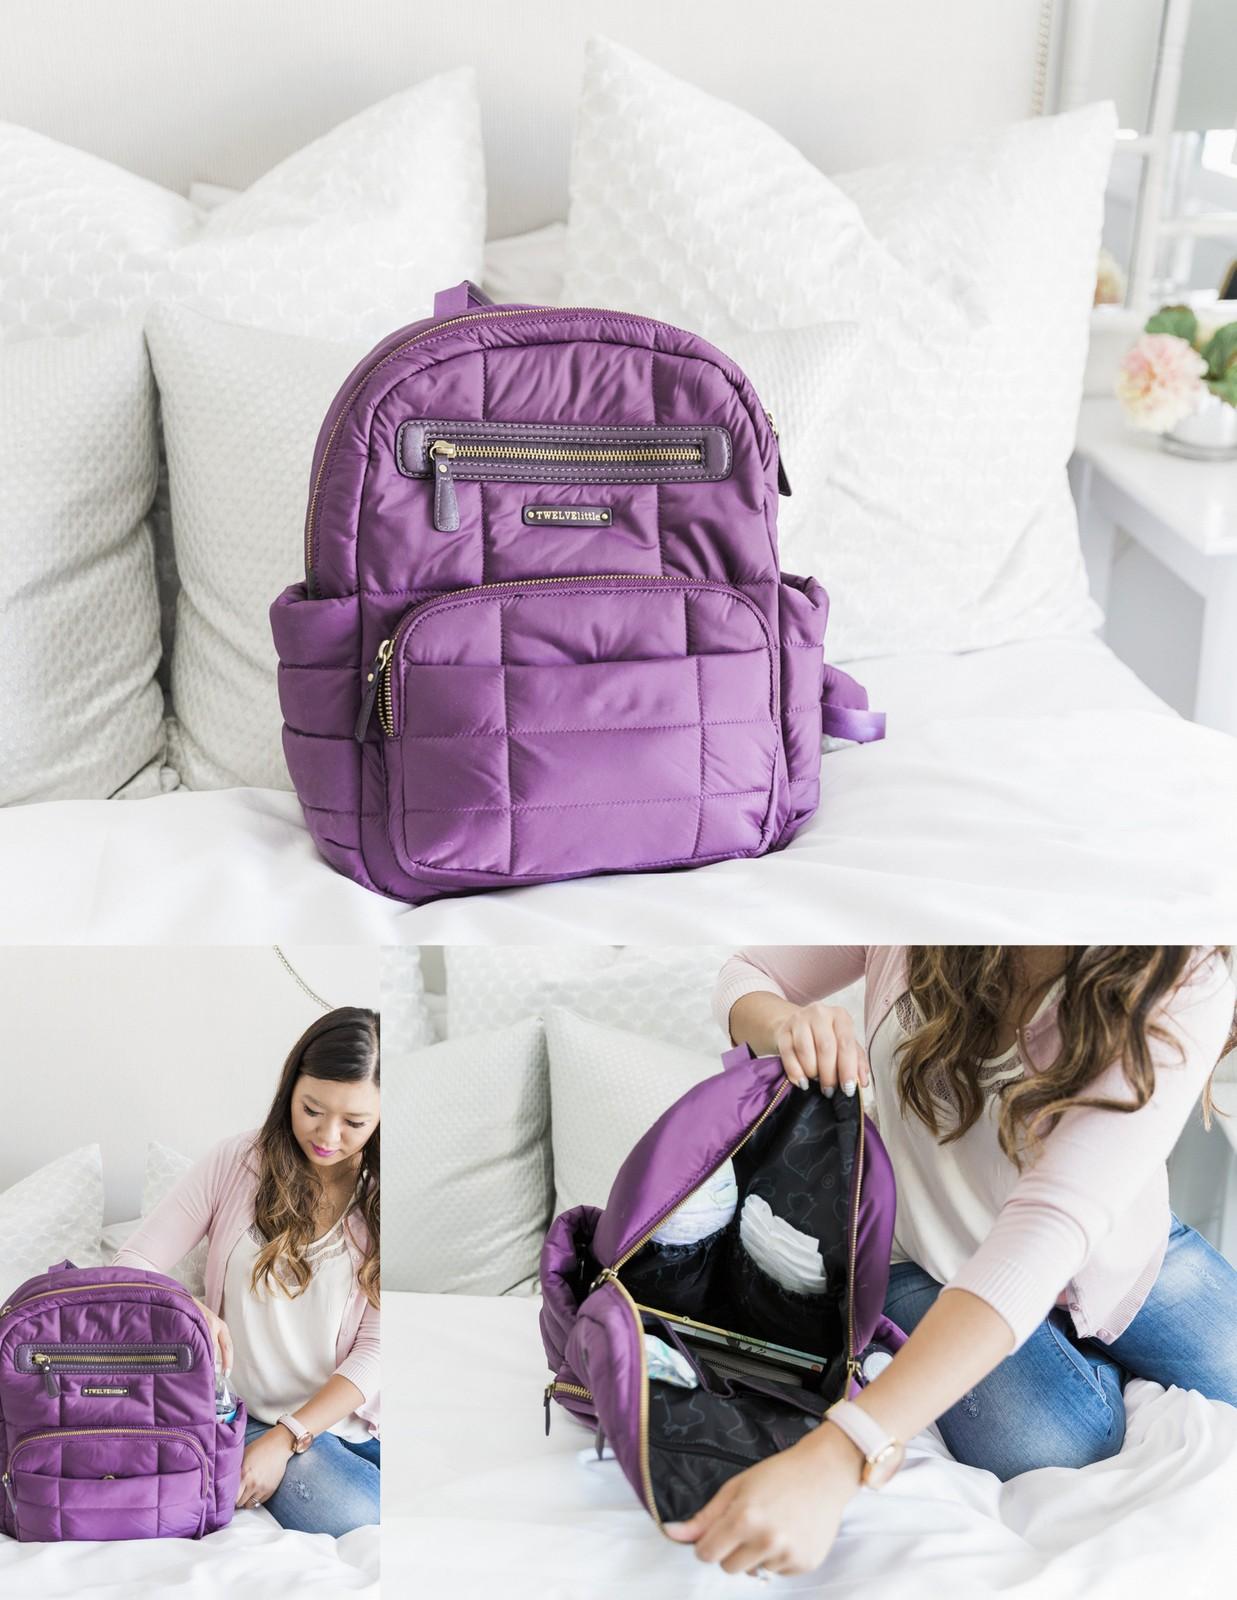 twelve little backpack